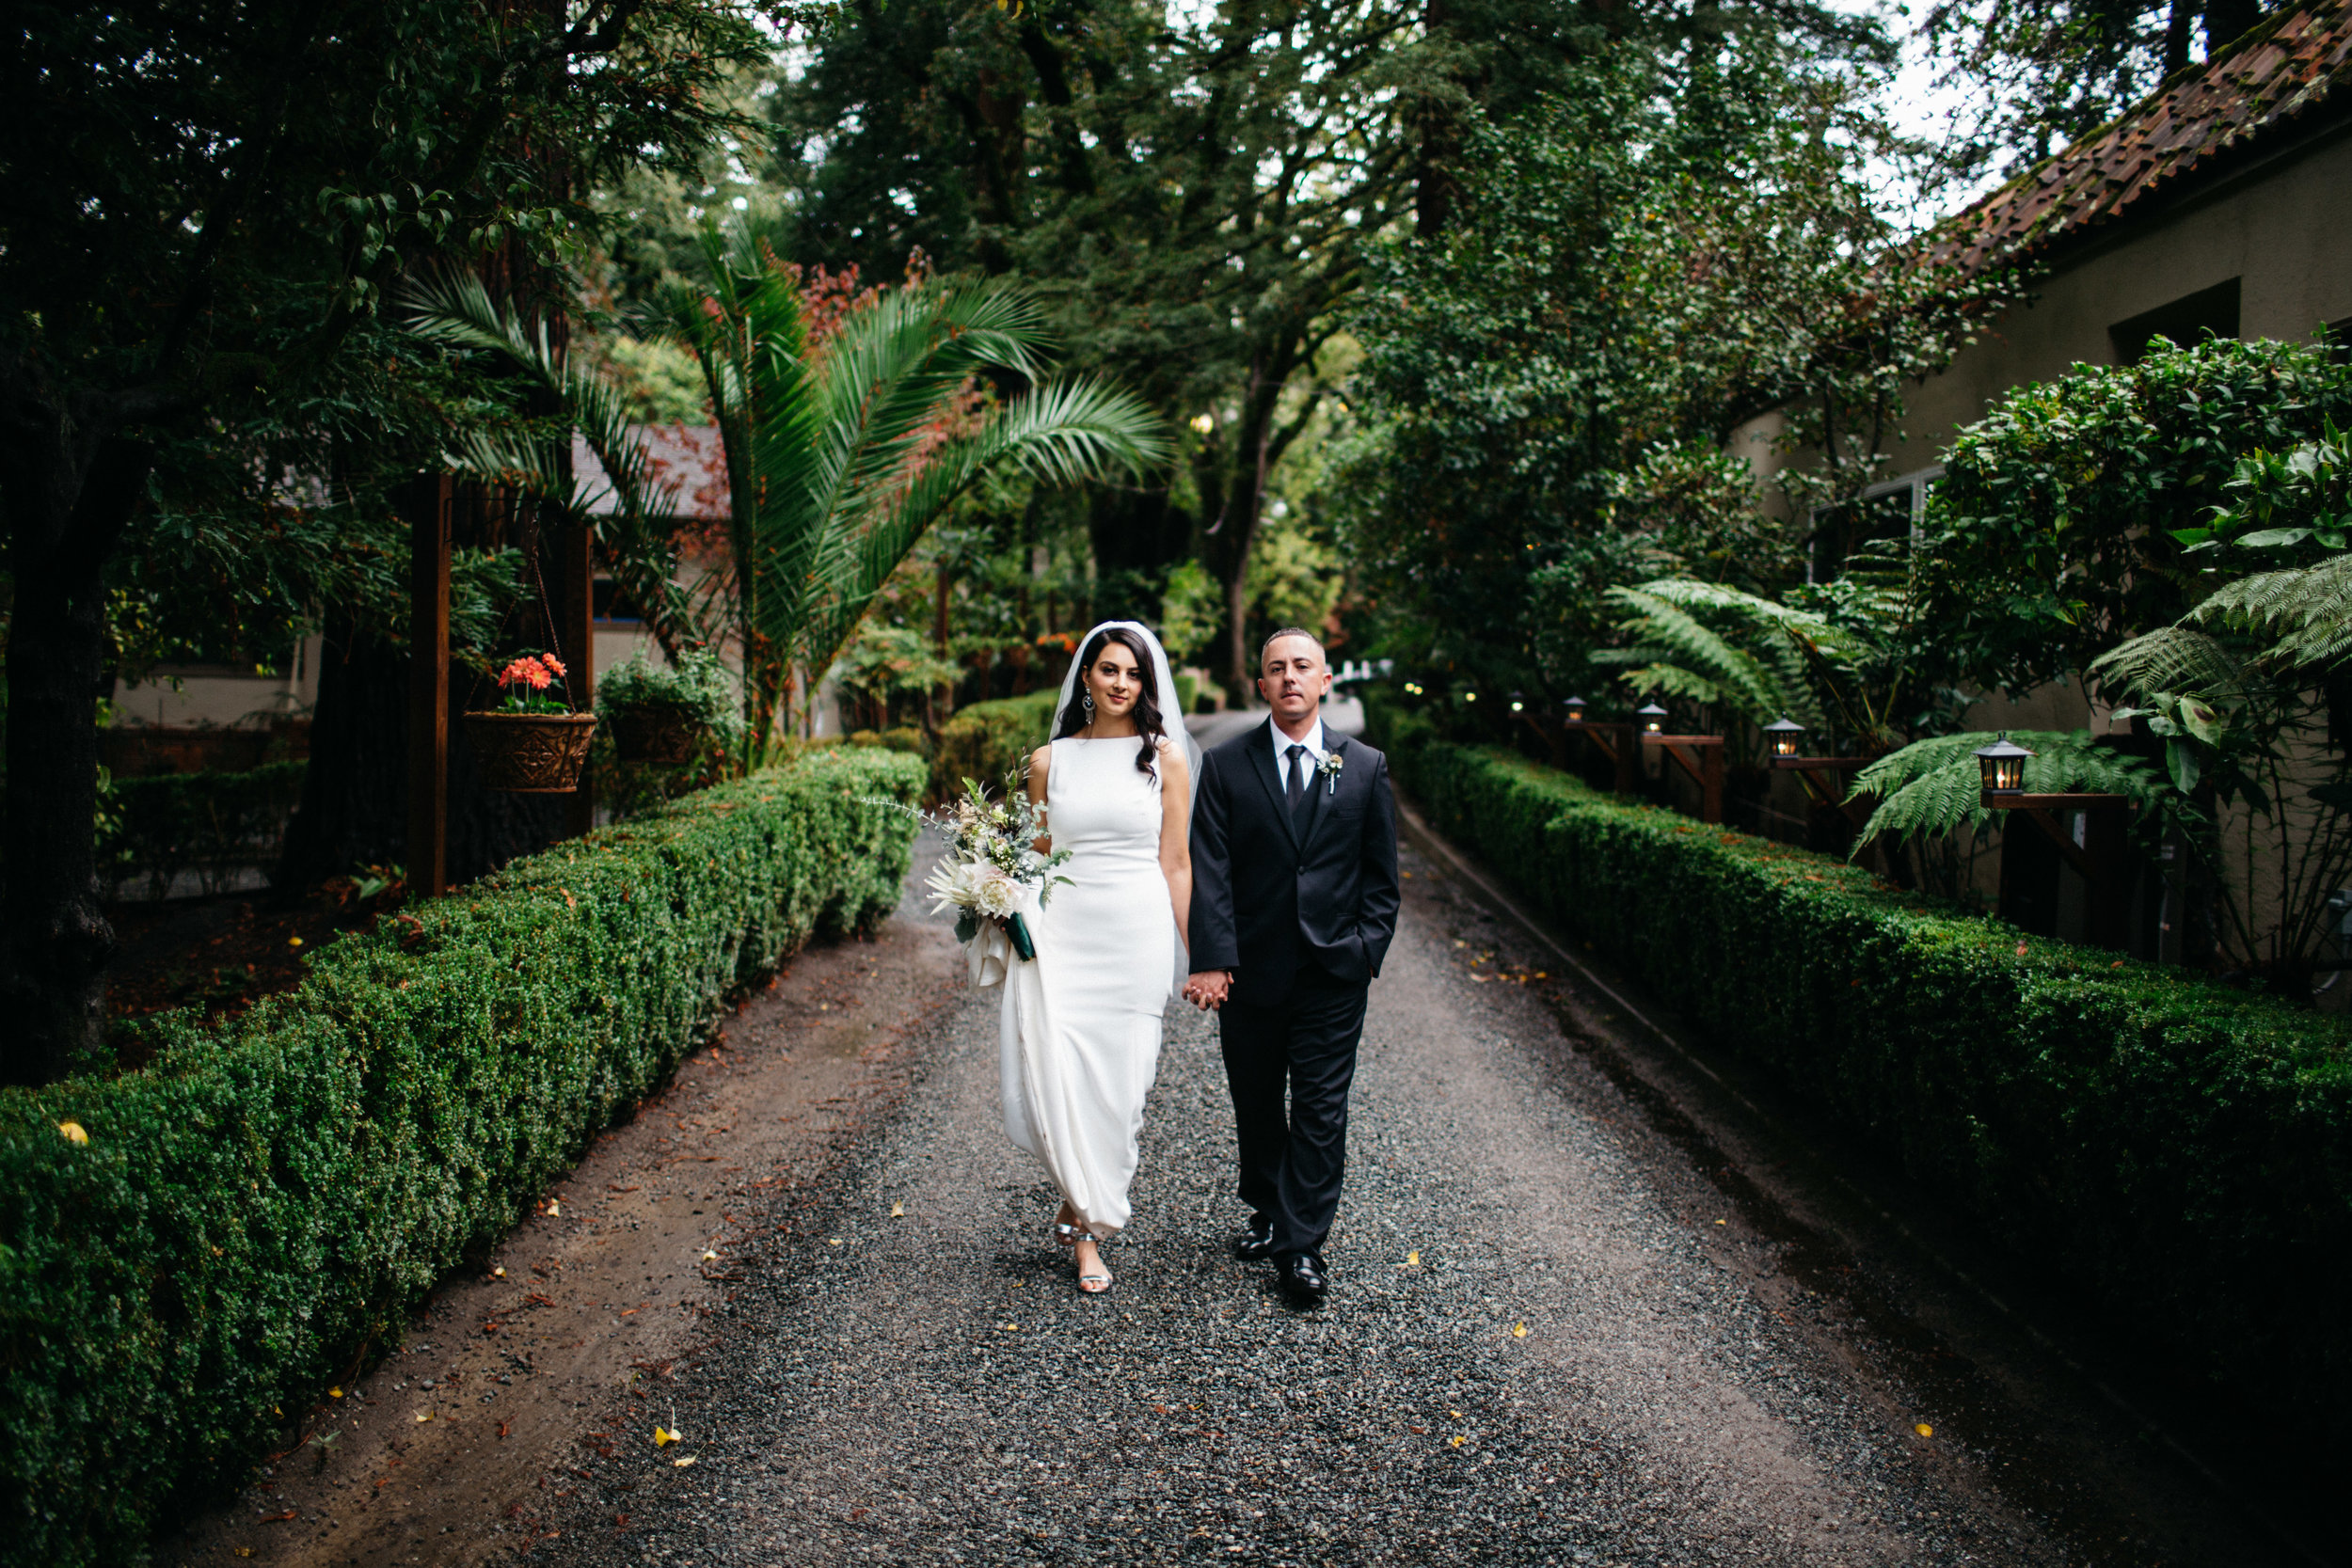 sweet_and_crafty_jocelyn_domingo_wedding_portfolio_037.jpg